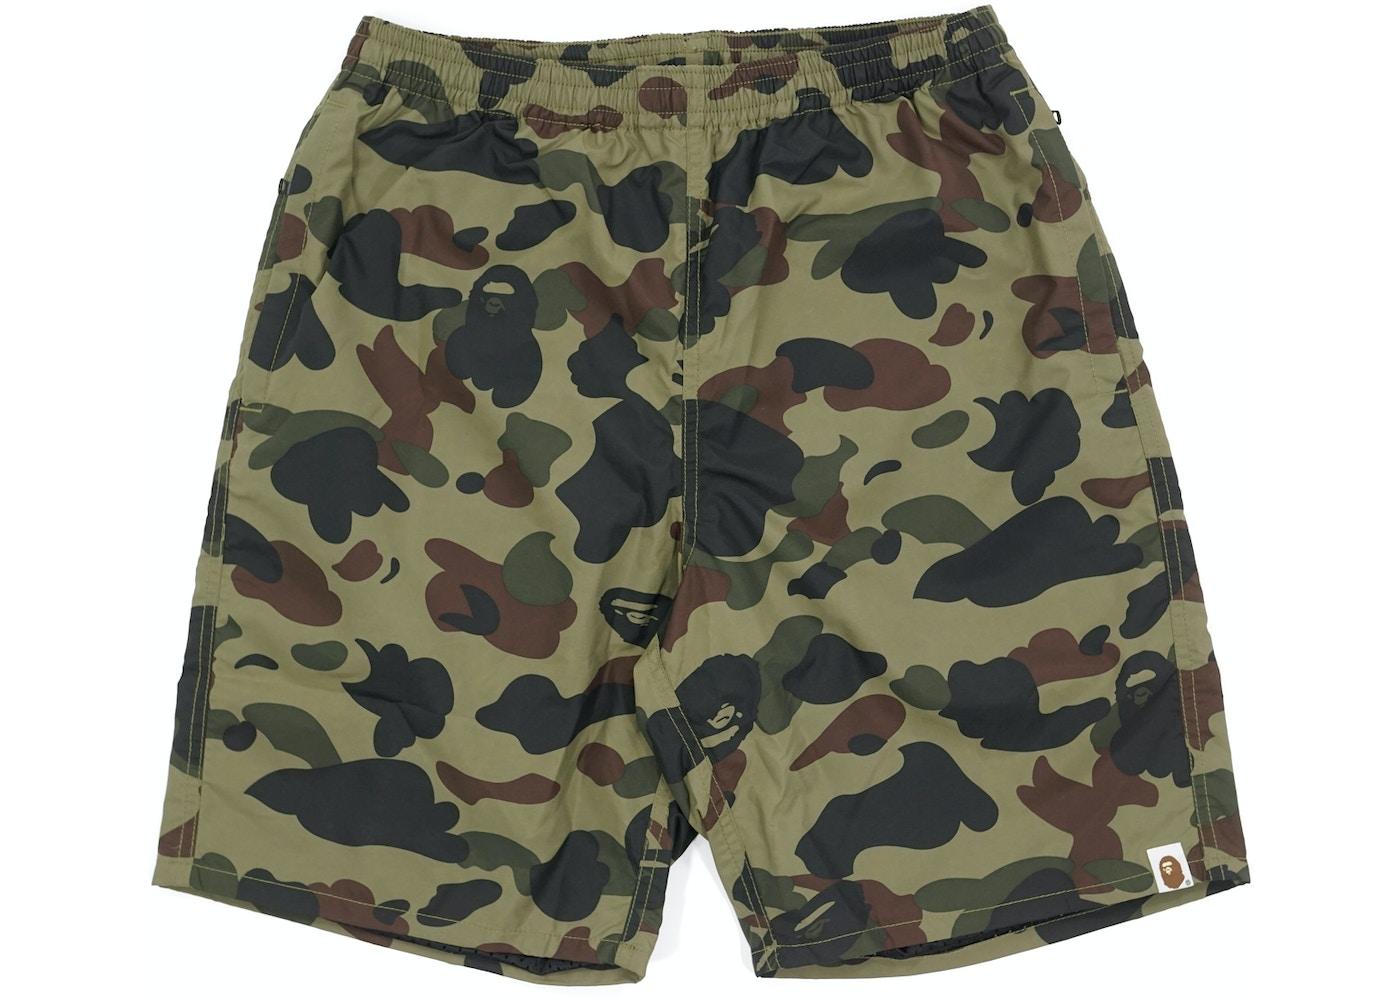 22edde69f6 BAPE 1st Camo Beach Shorts Green -